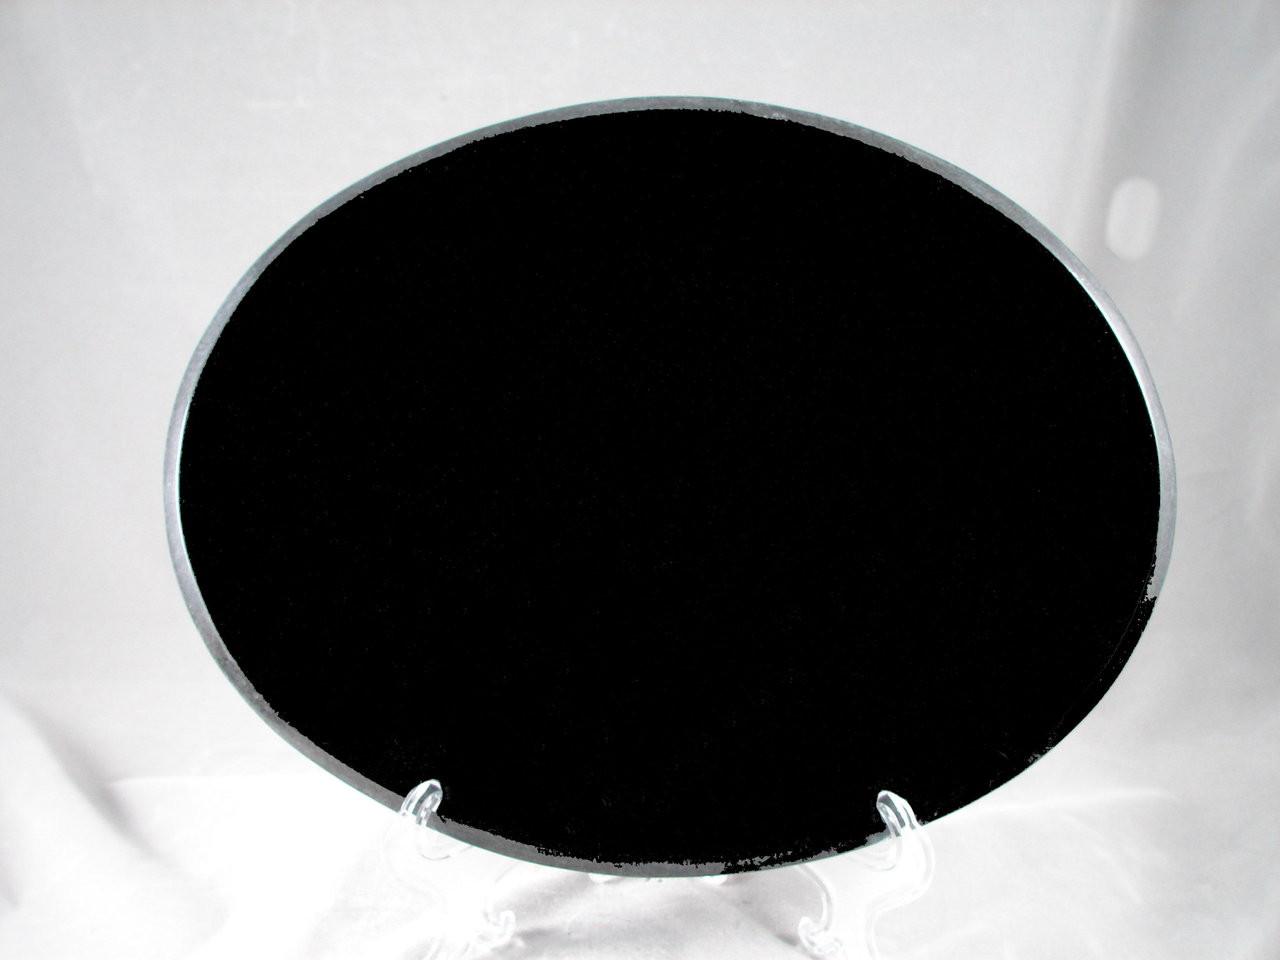 "G-MB-5x7OvalBEP/:  LaserGrade, MB Black Granite, 5"" x 7"" x 7-8mm"" , Beveled Edges Polished, (5 face polished) - Case of 10"